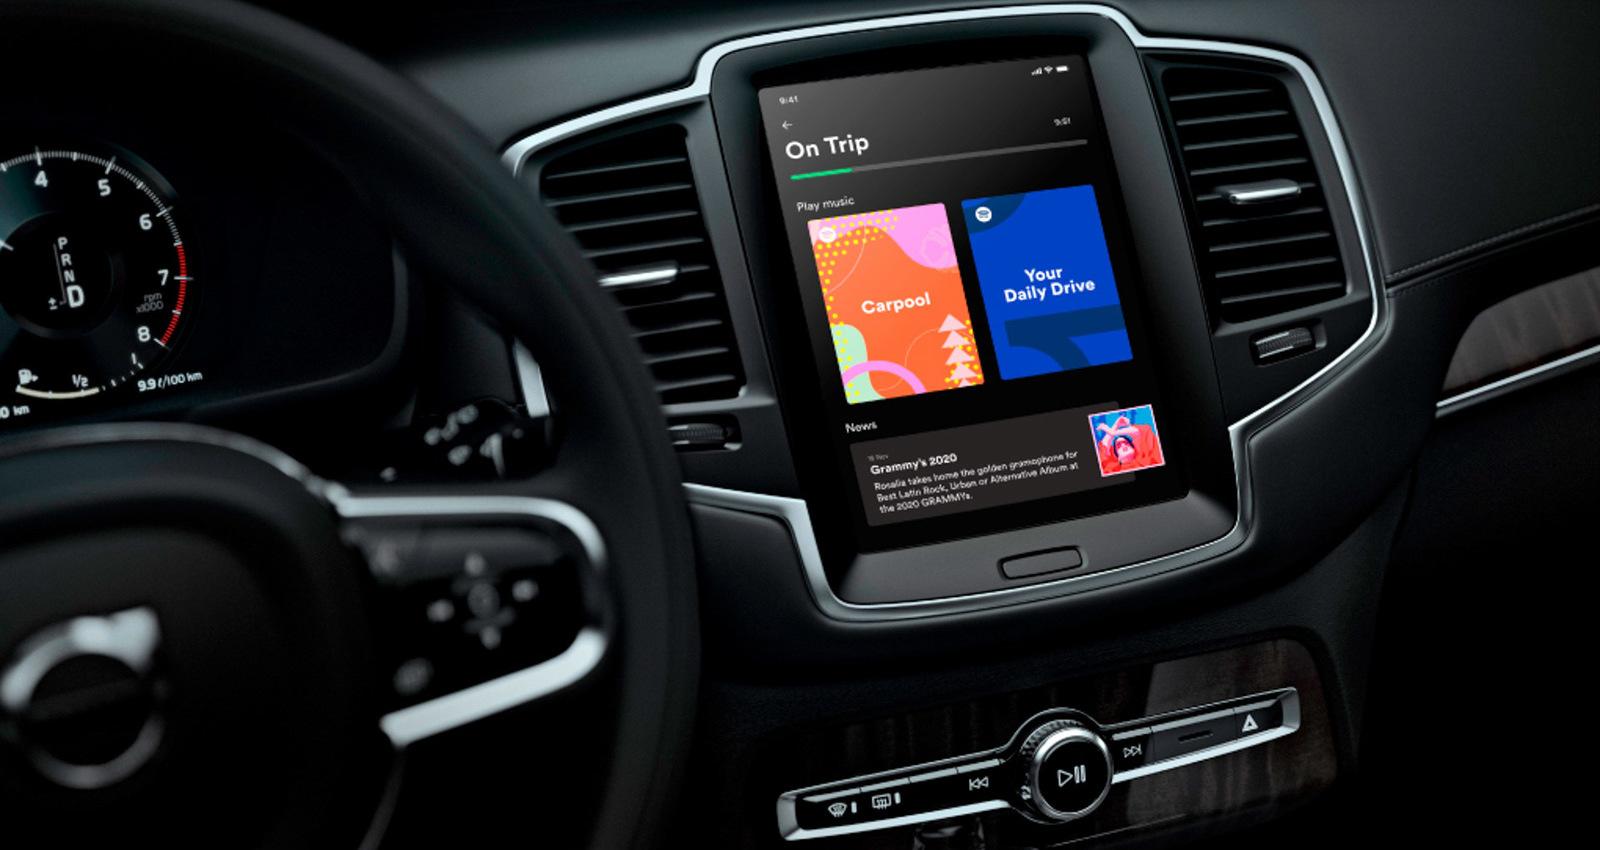 Spotify Carpool